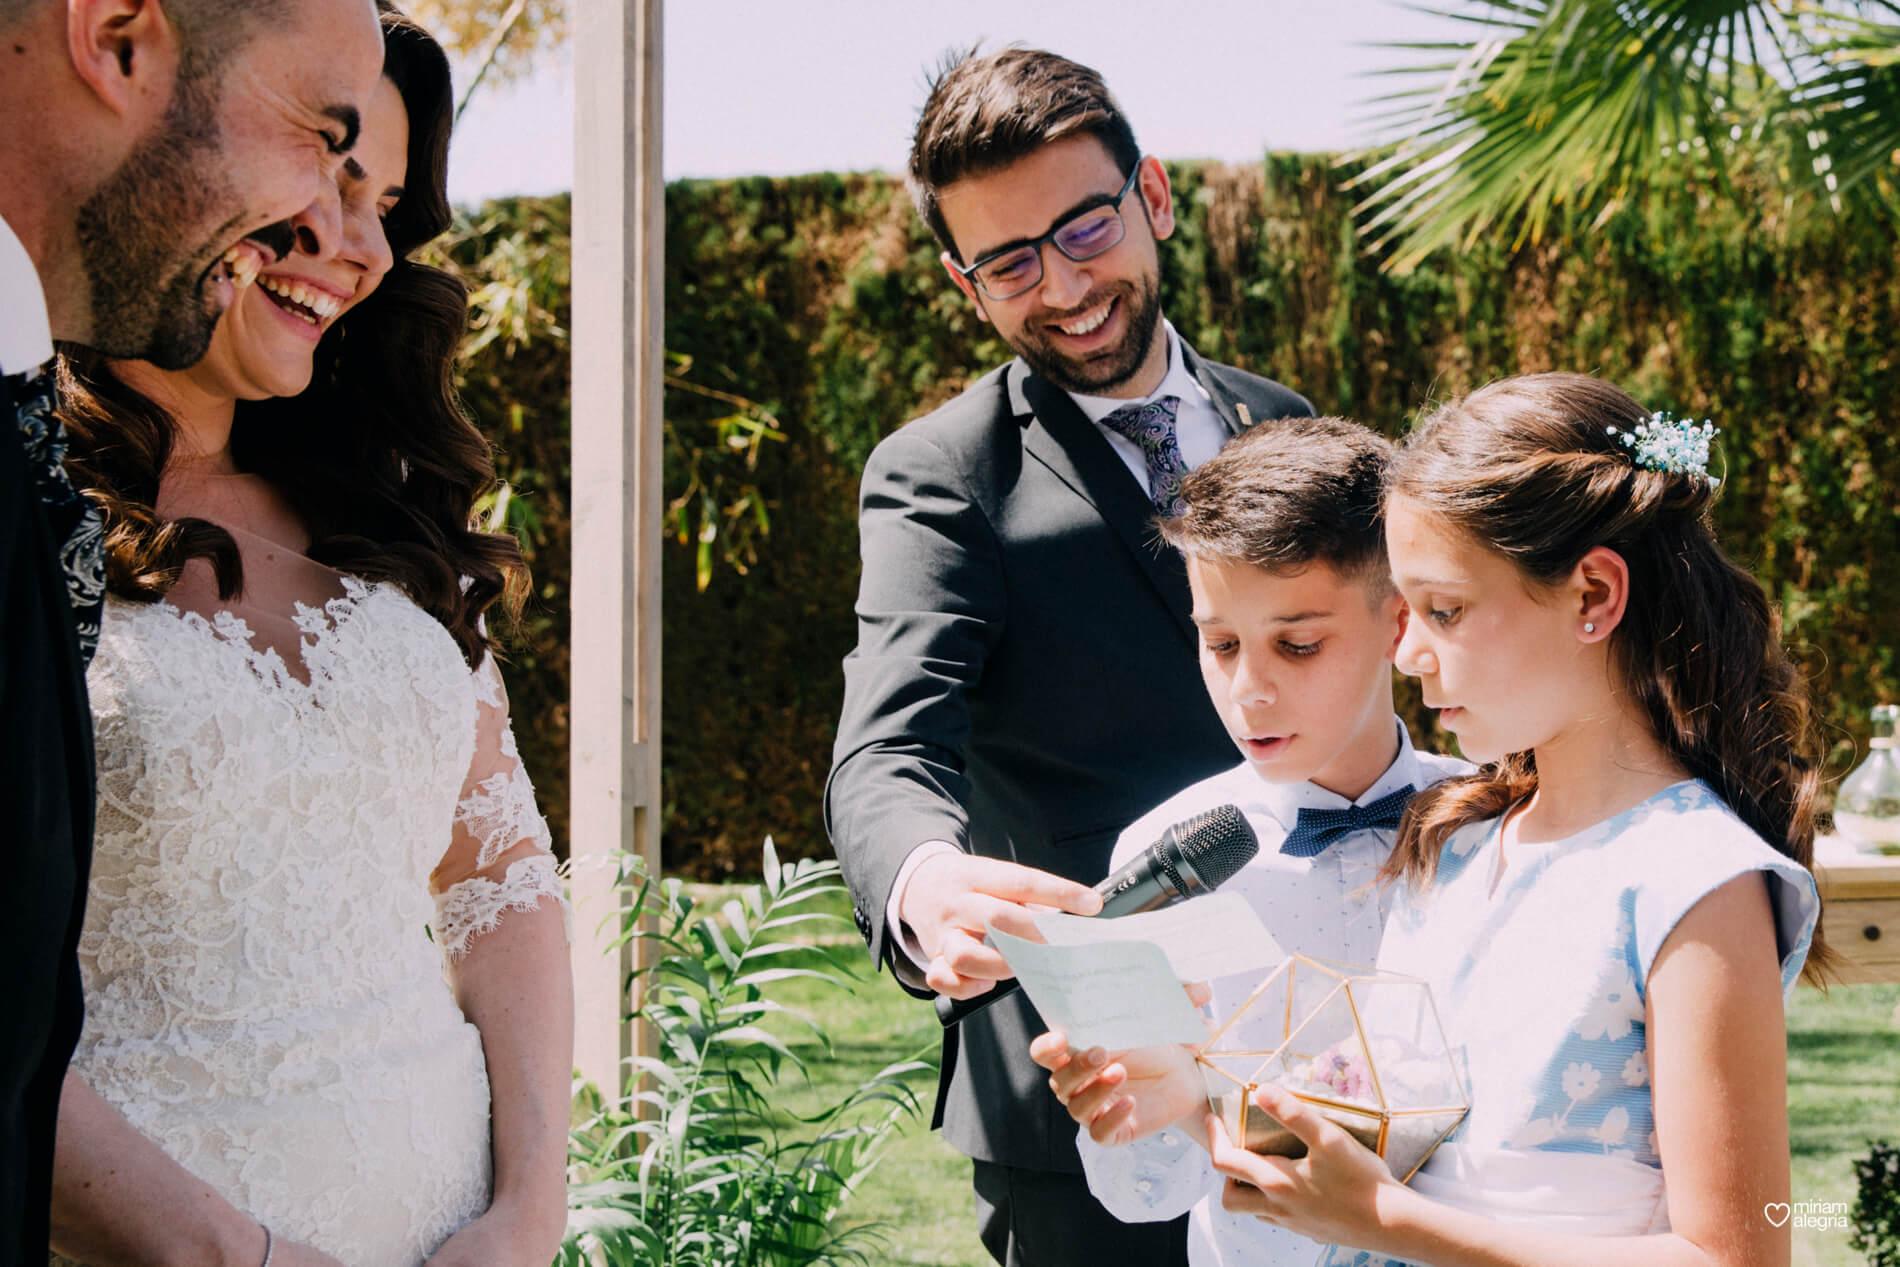 boda-en-finca-jurosa-miriam-alegria-63